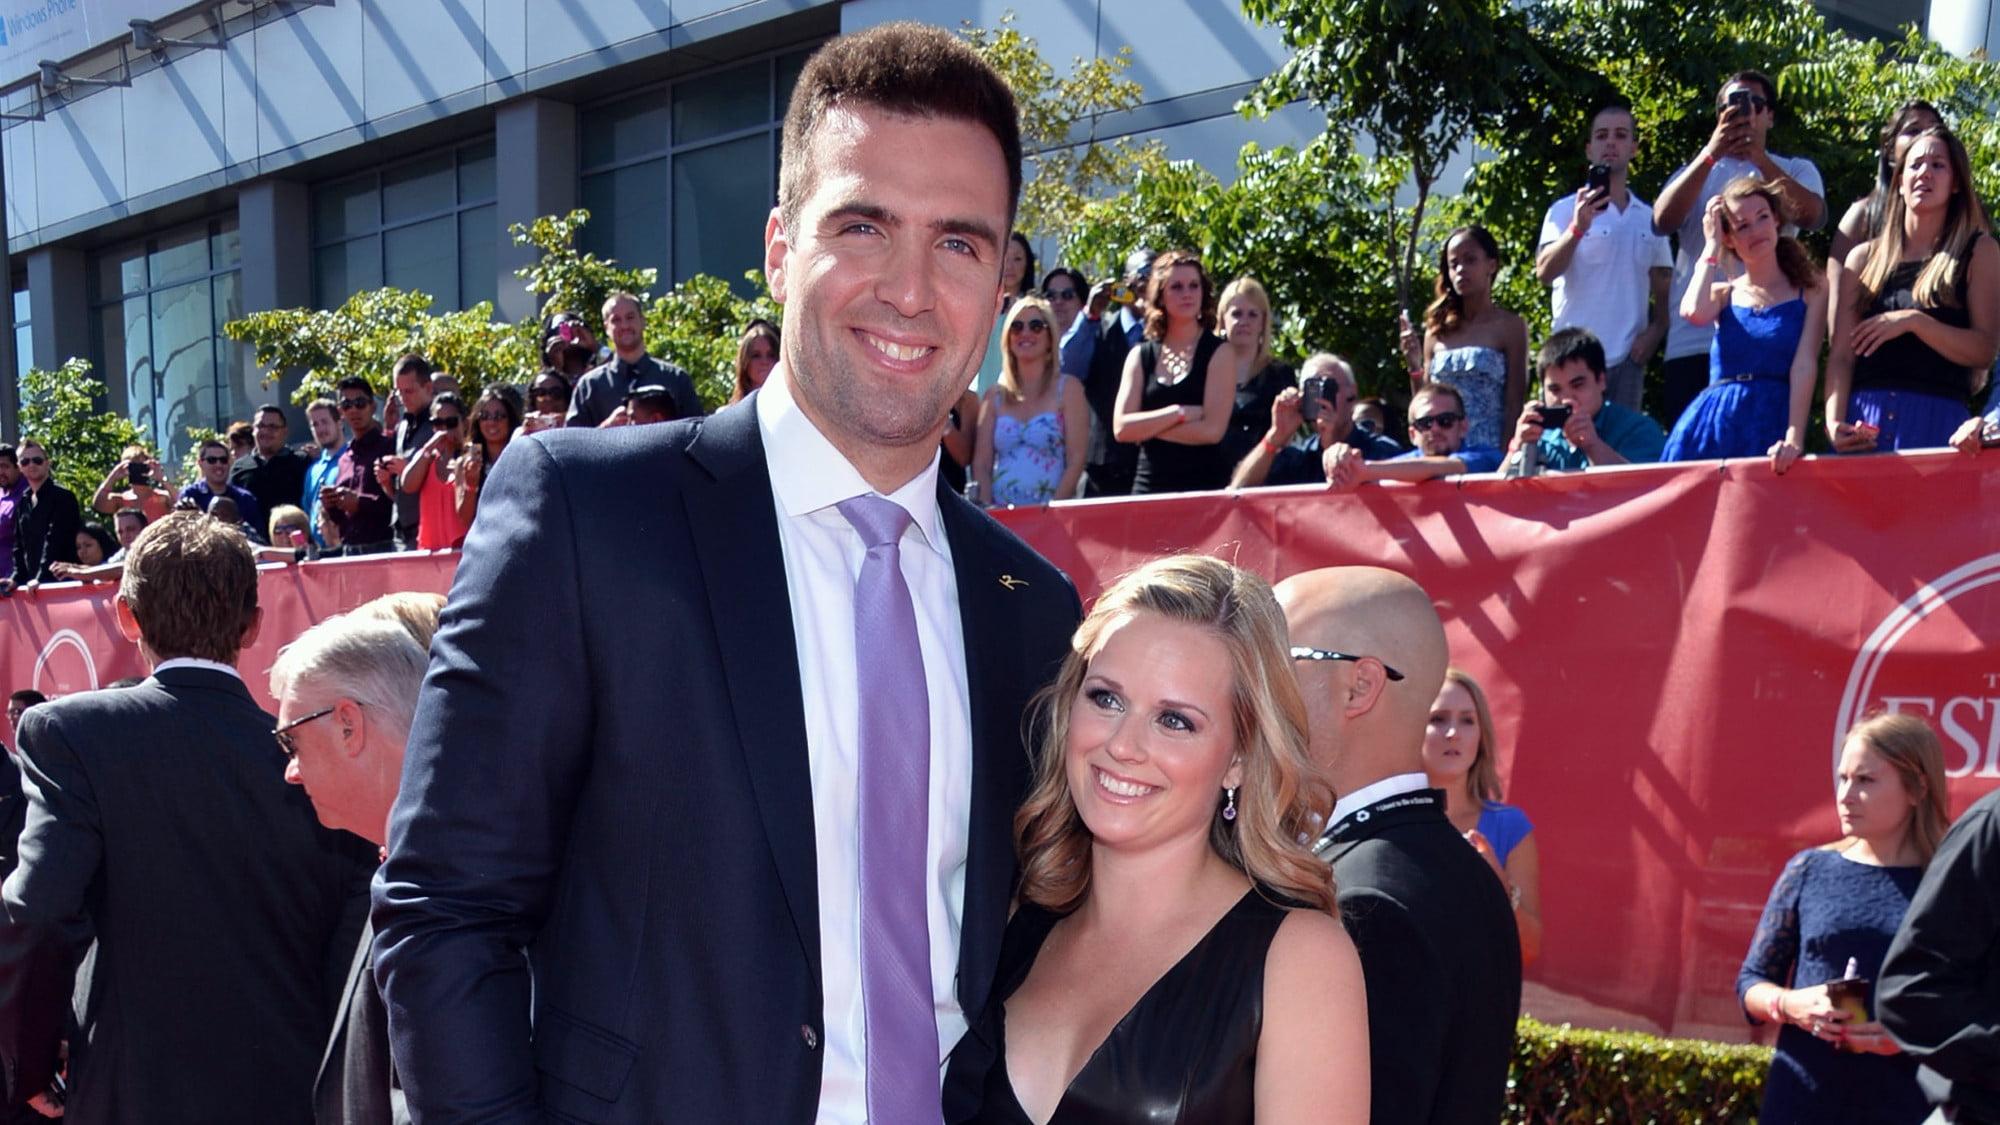 PHOTOS: Joe Flacco's Wife is Dana Grady Flacco